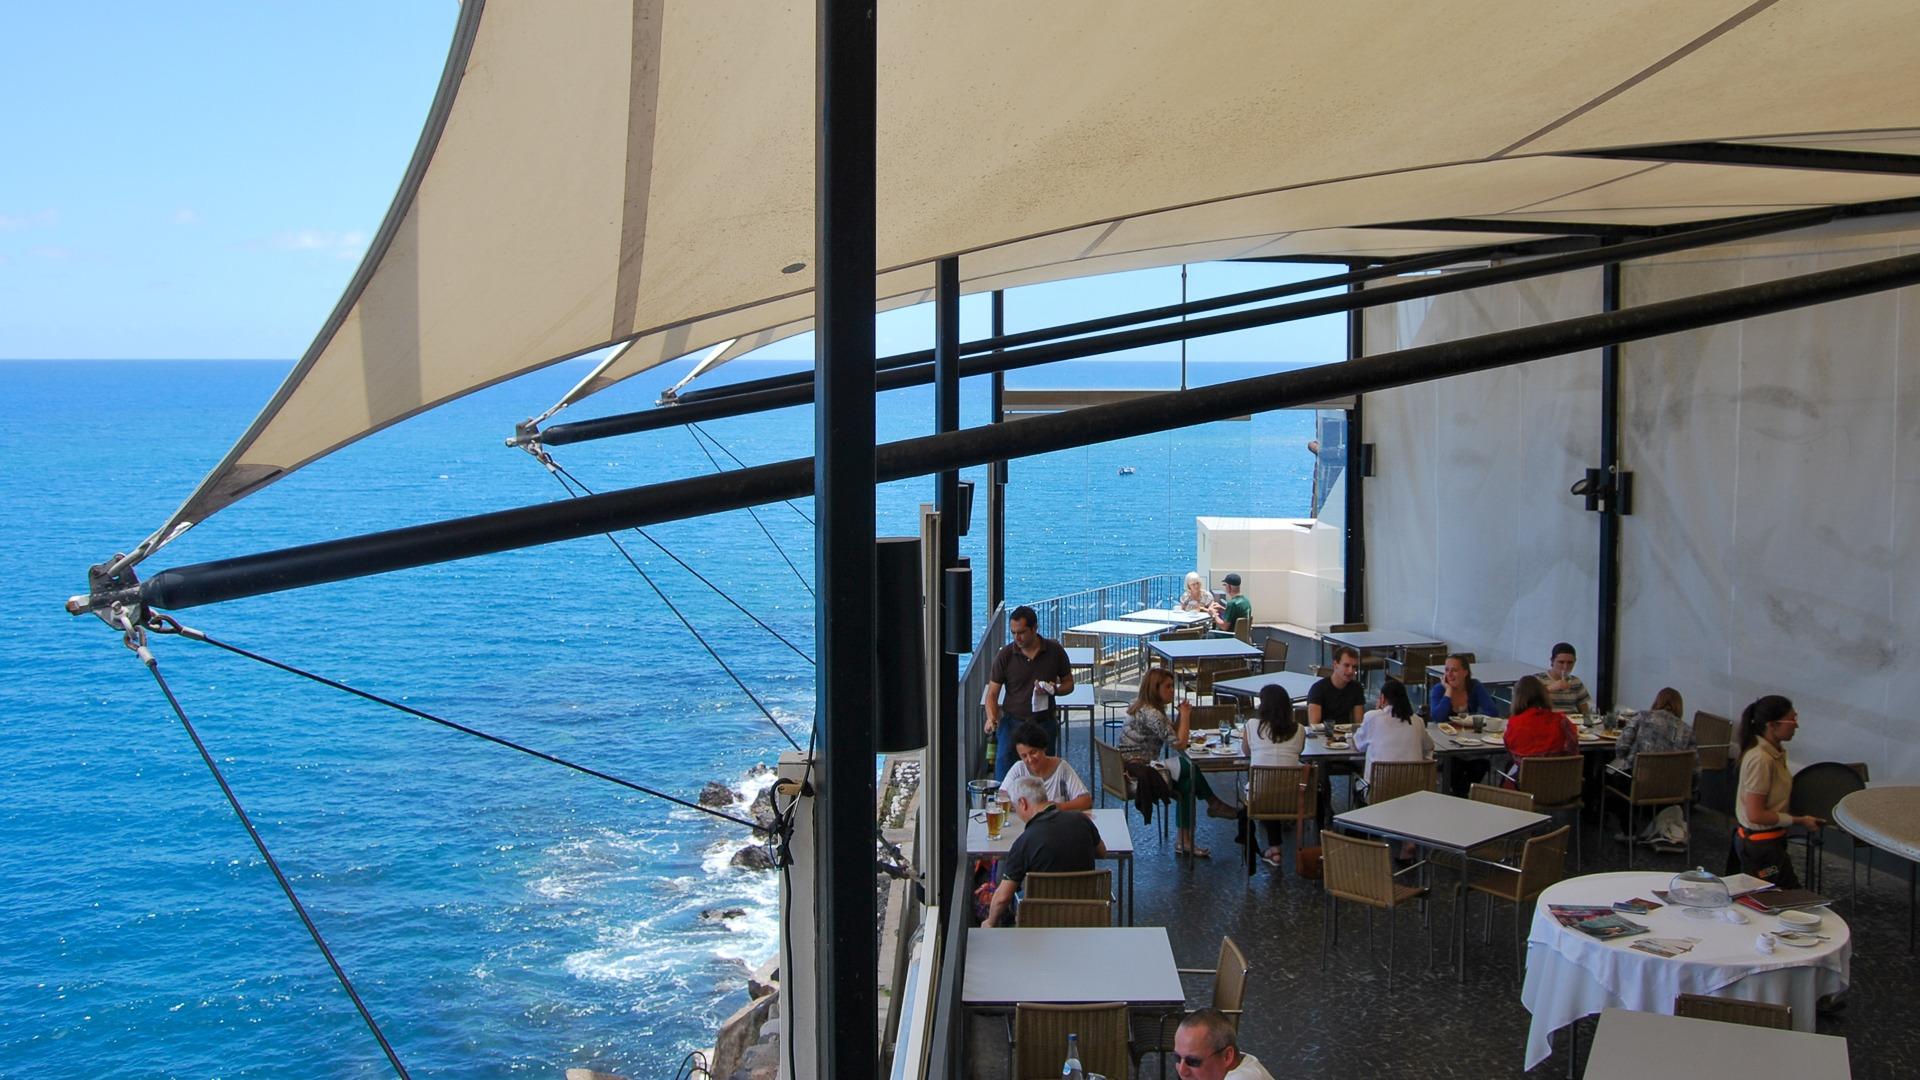 Restaurant Riso Funchal